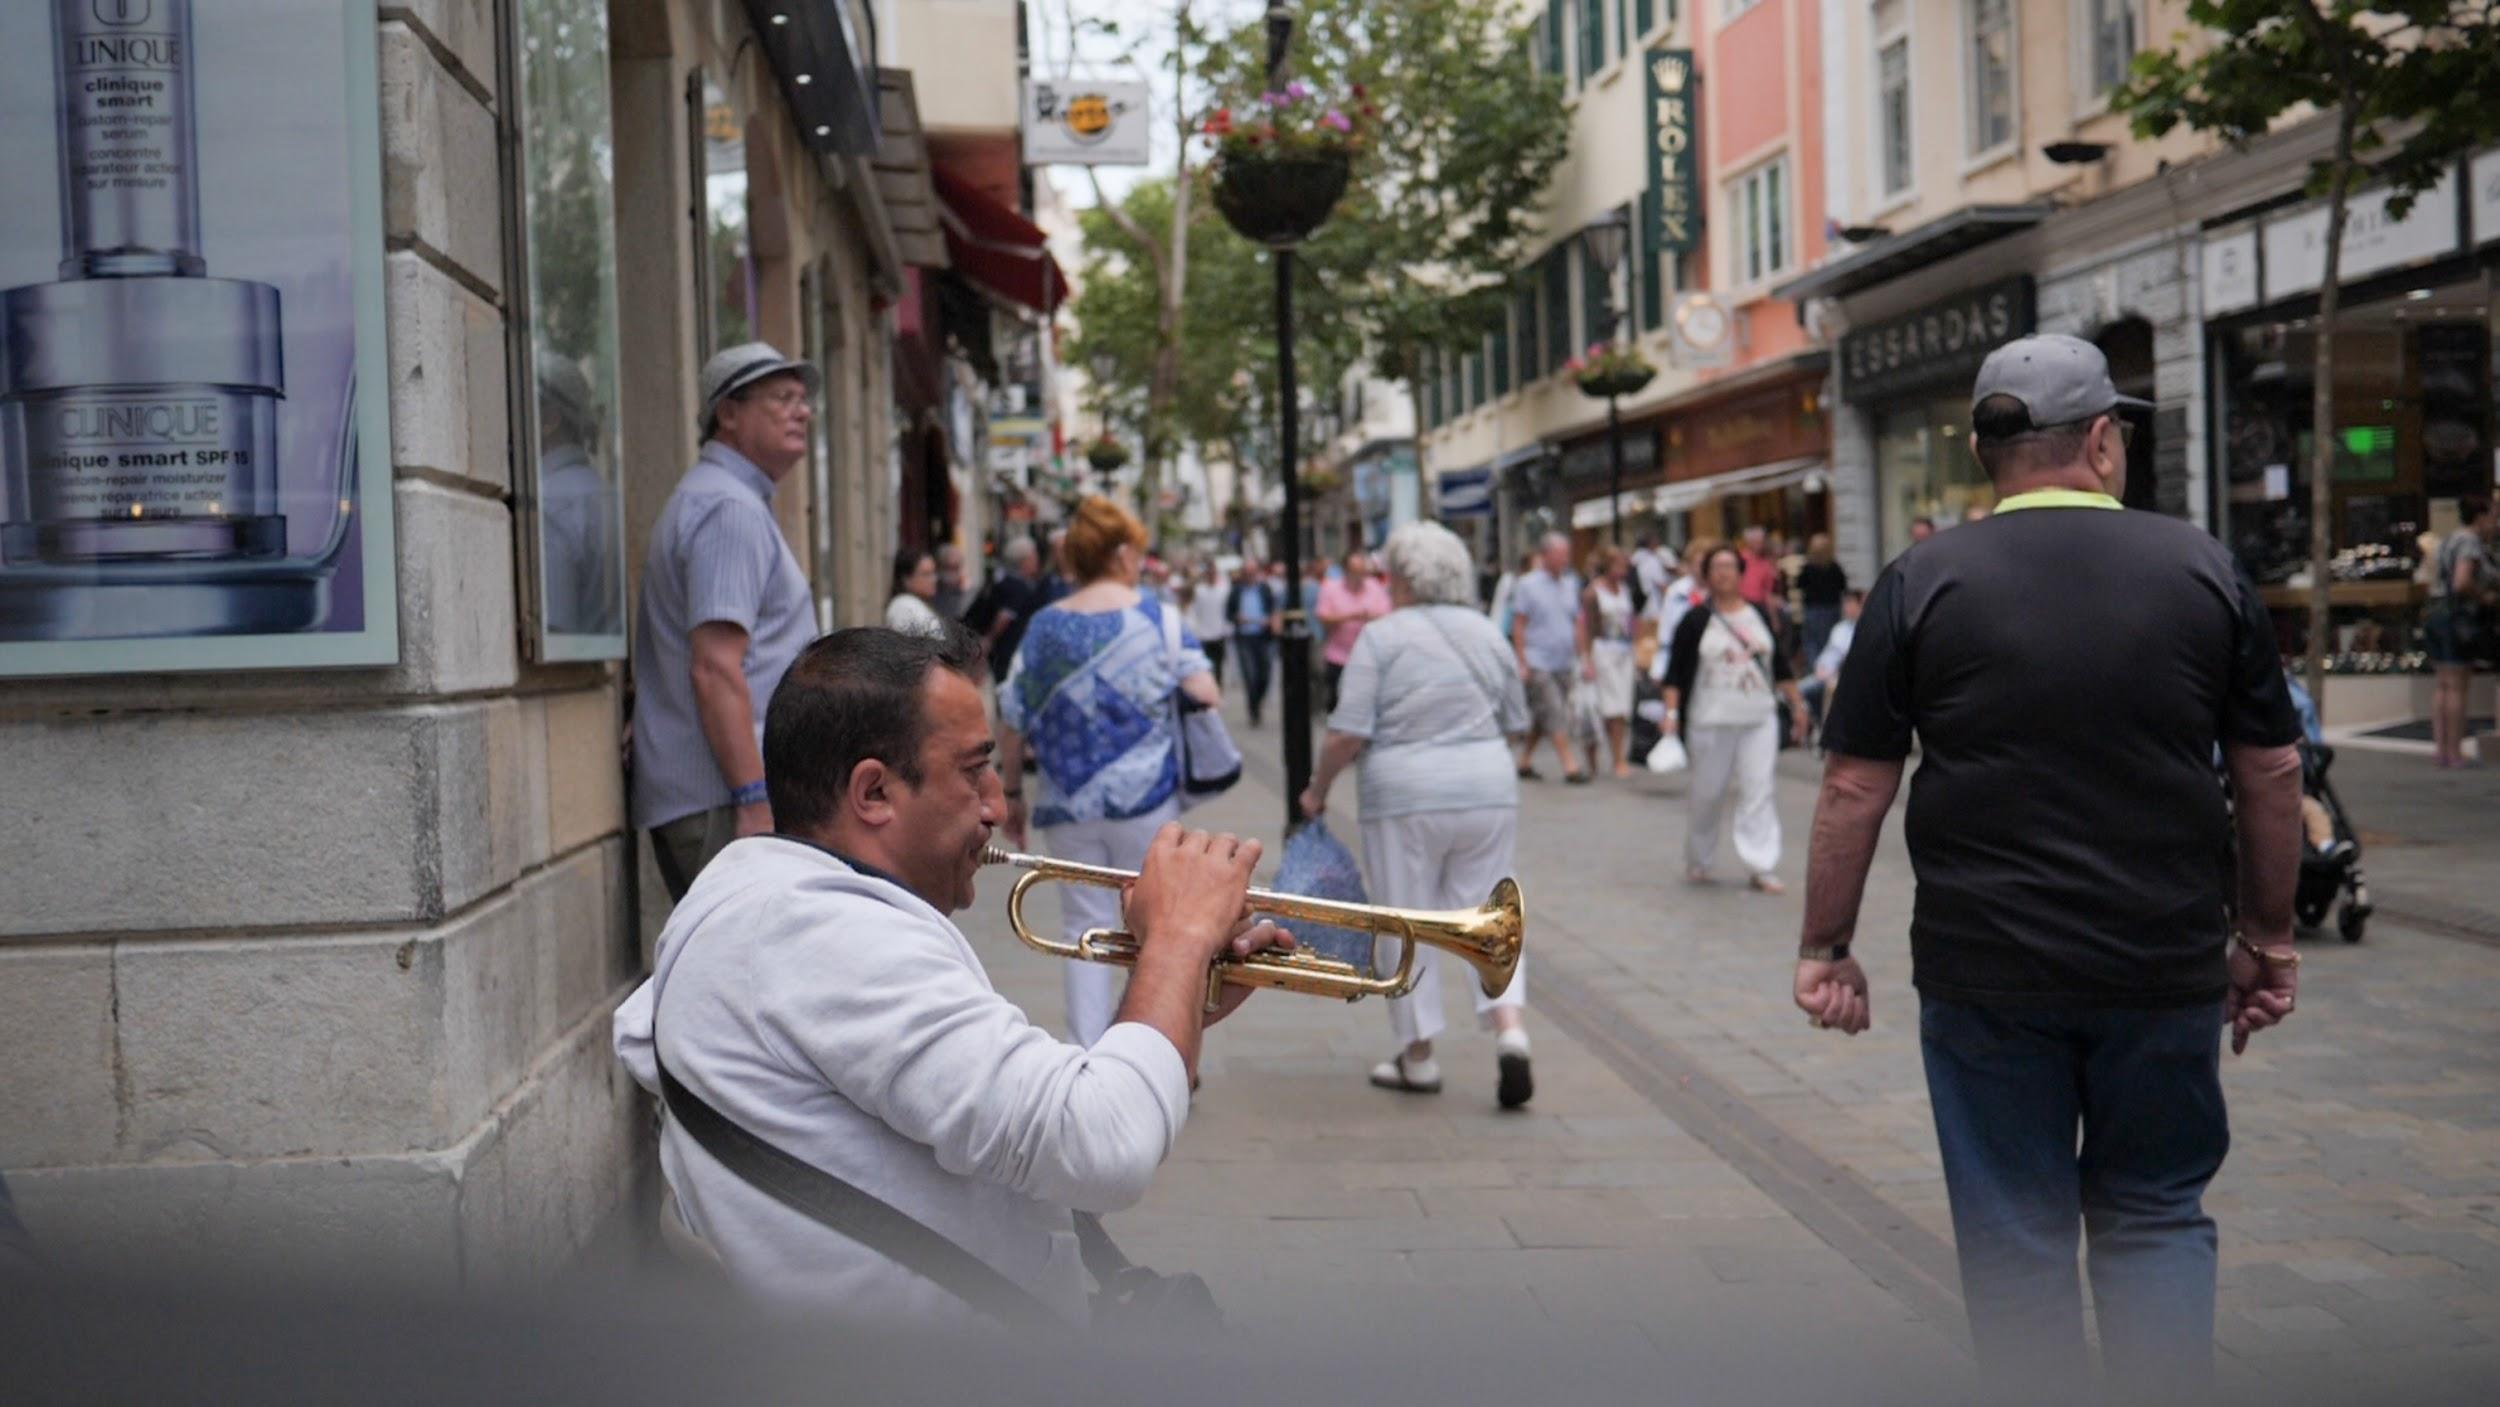 Фото: Уличный музыкант